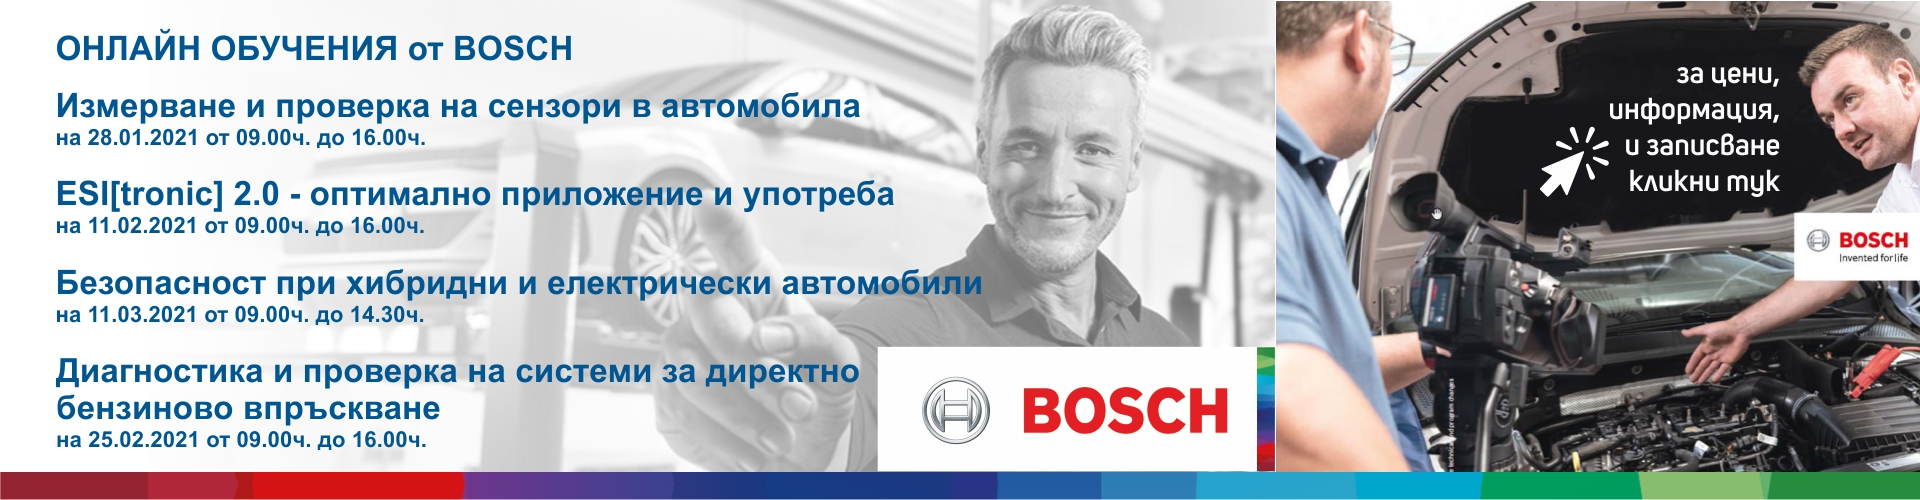 bosch-online-training-2021_banner.jpg